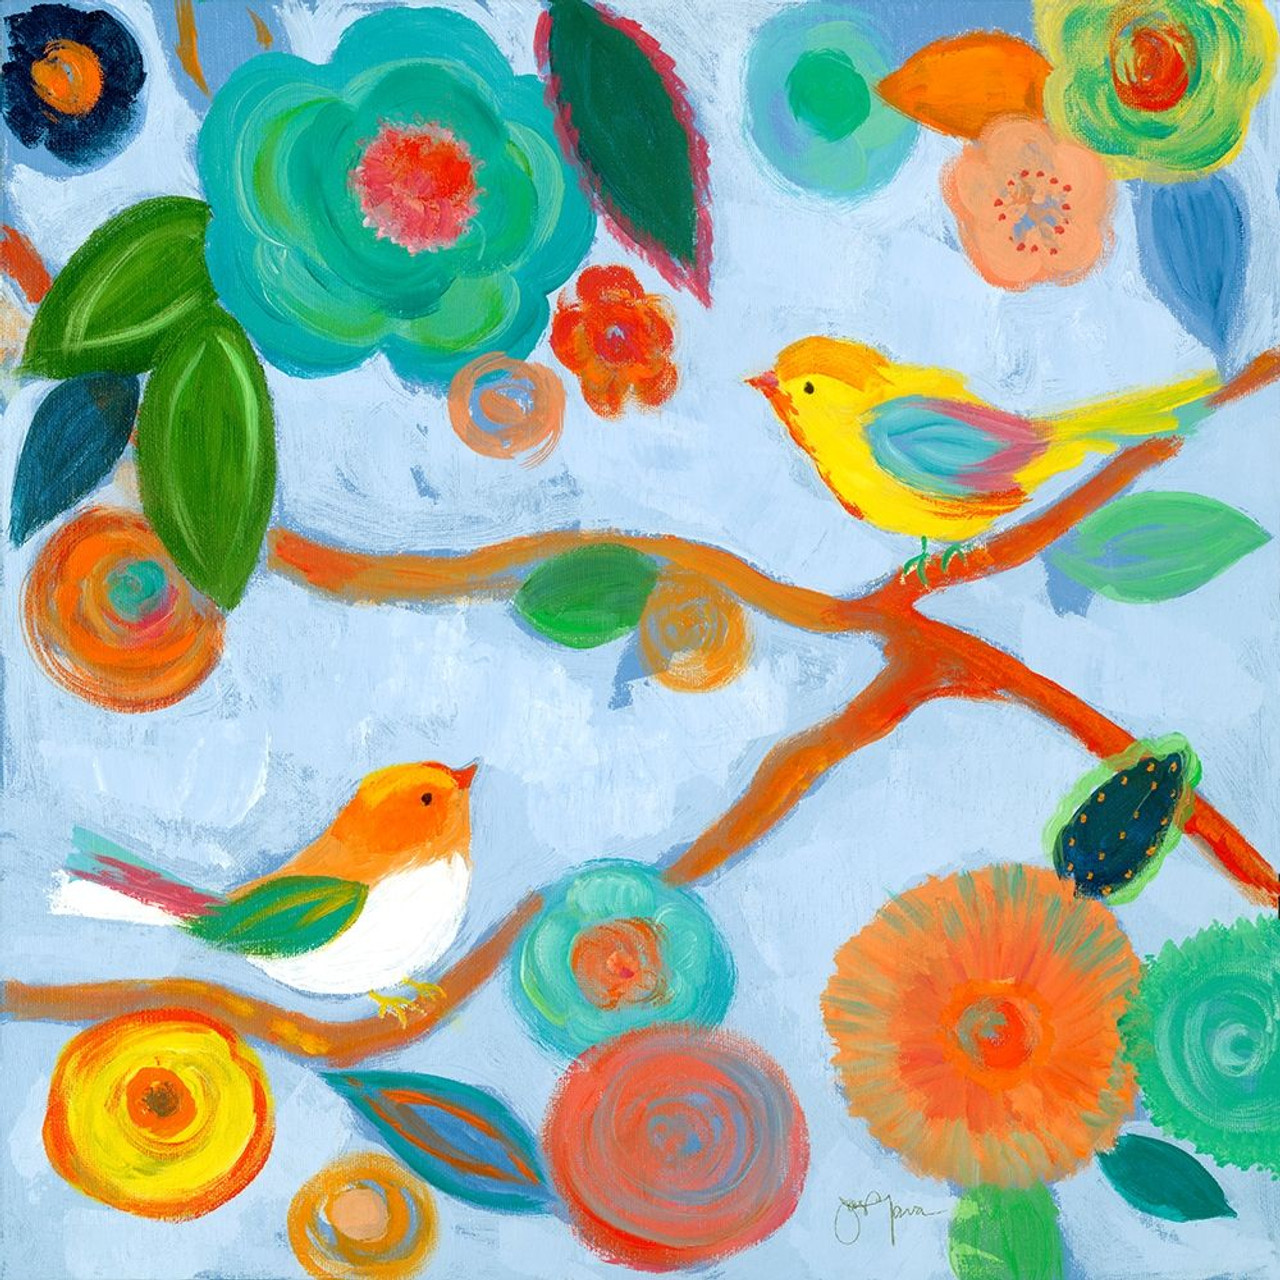 Birds And Whimsy I Poster Print By Tava Studios Item Varpdx19268 Posterazzi